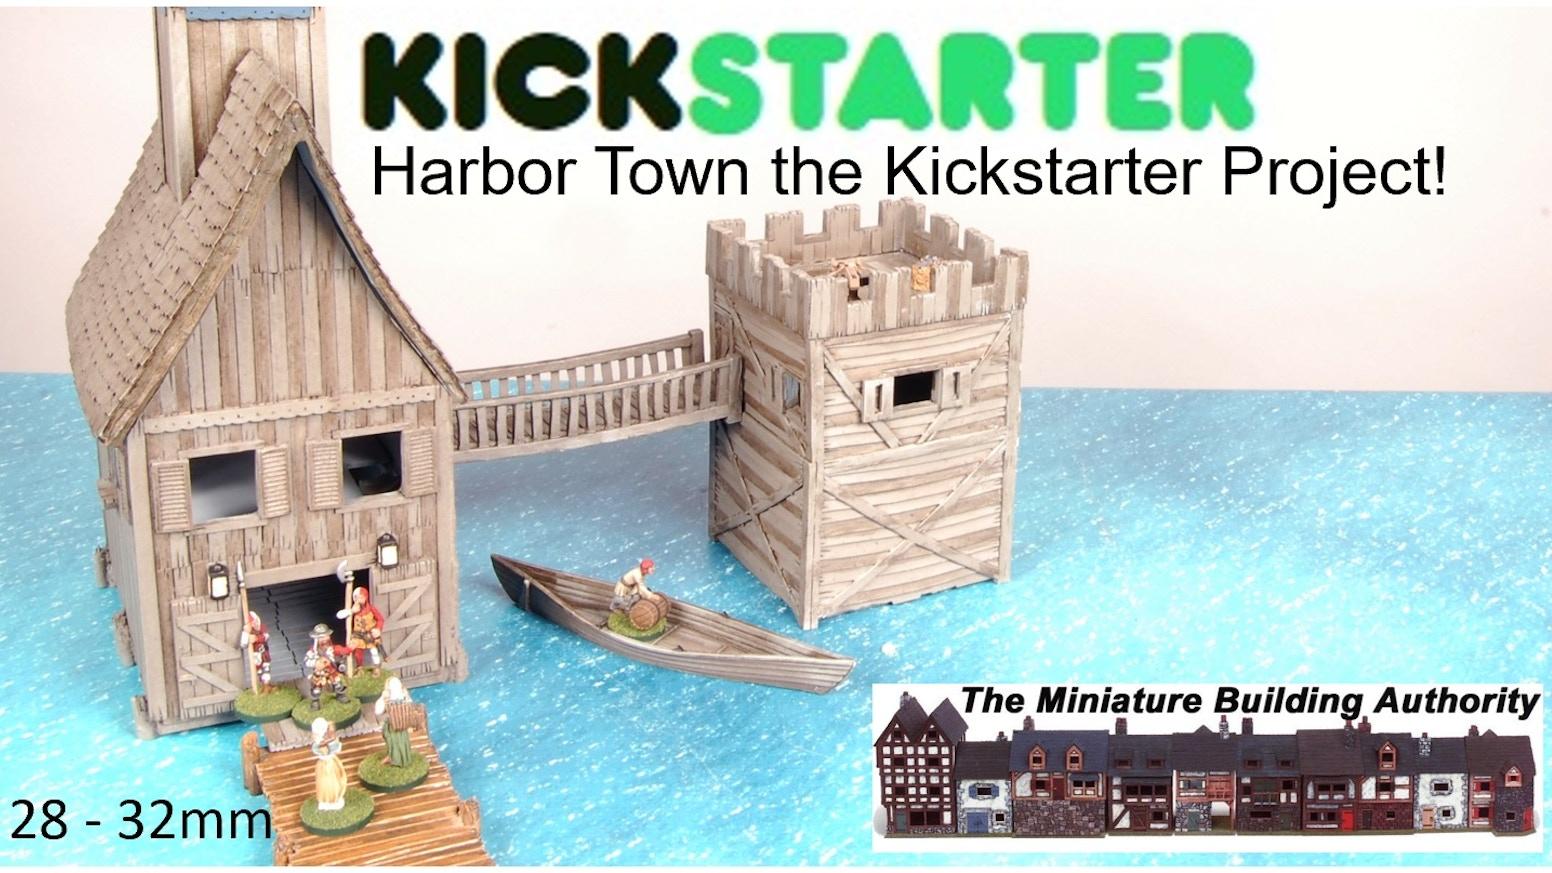 Harbor Town by Miniature Building Authority, Inc  — Kickstarter